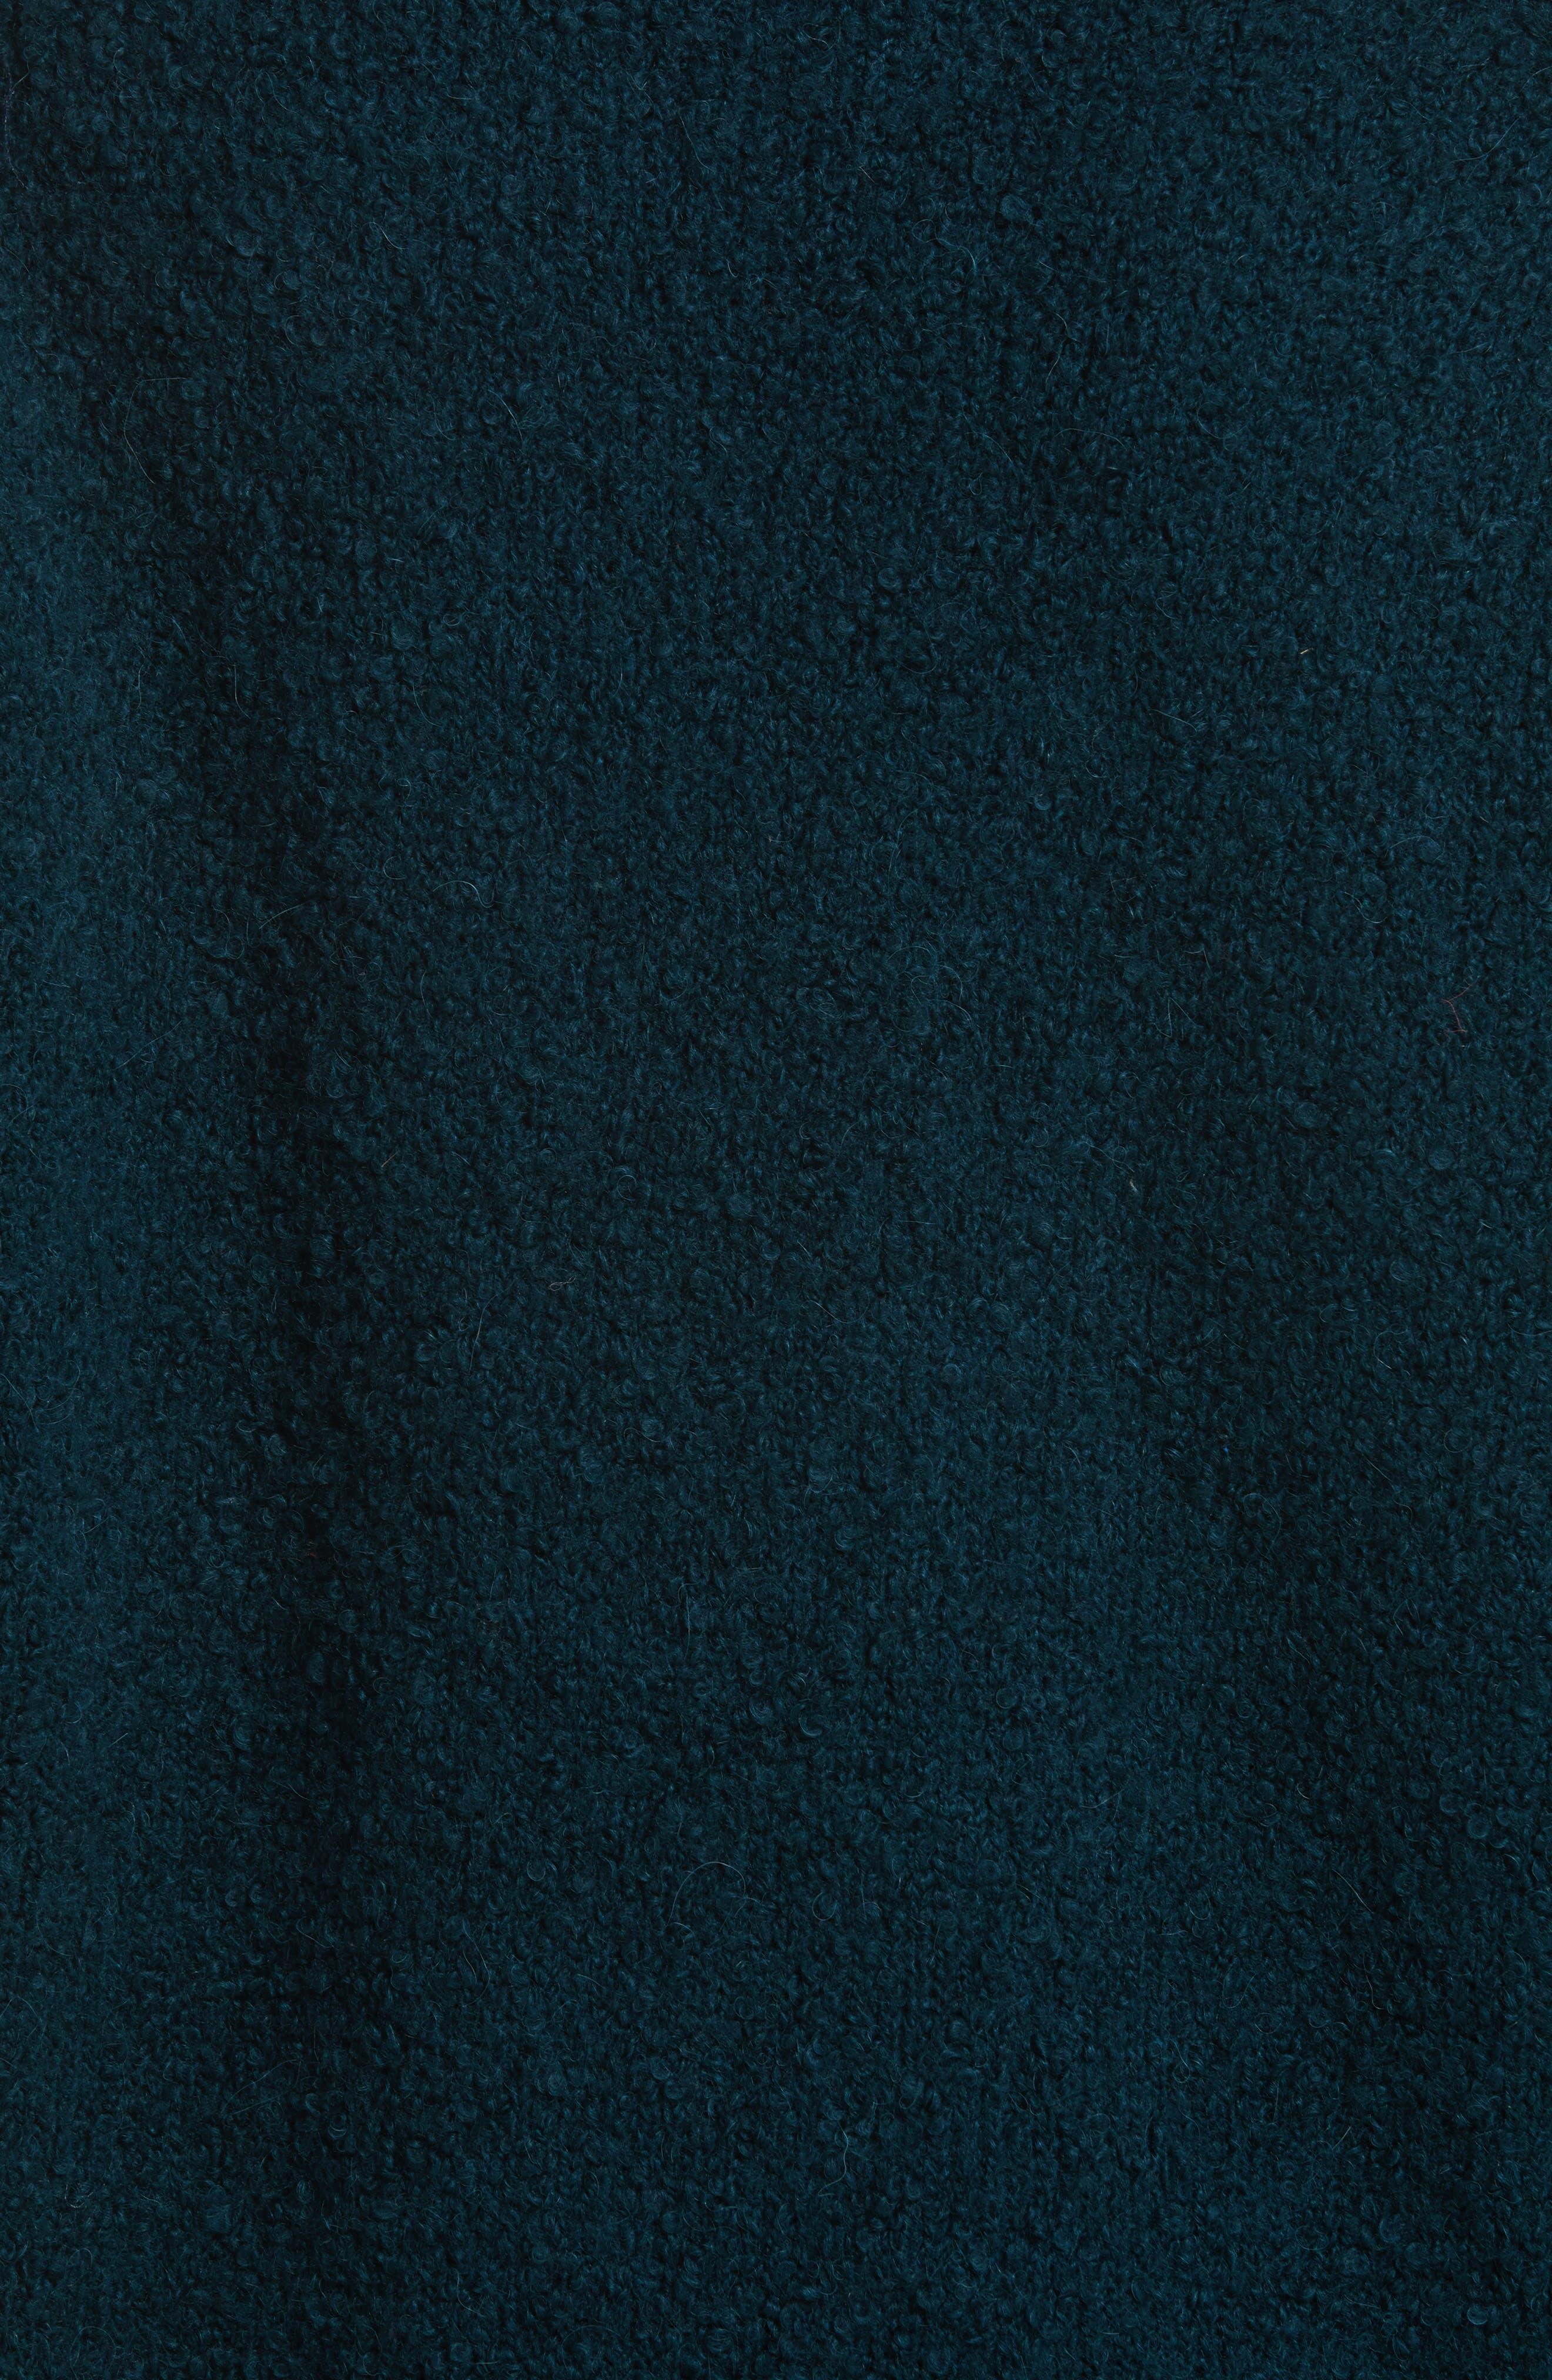 Lofty V-Neck Sweater,                             Alternate thumbnail 30, color,